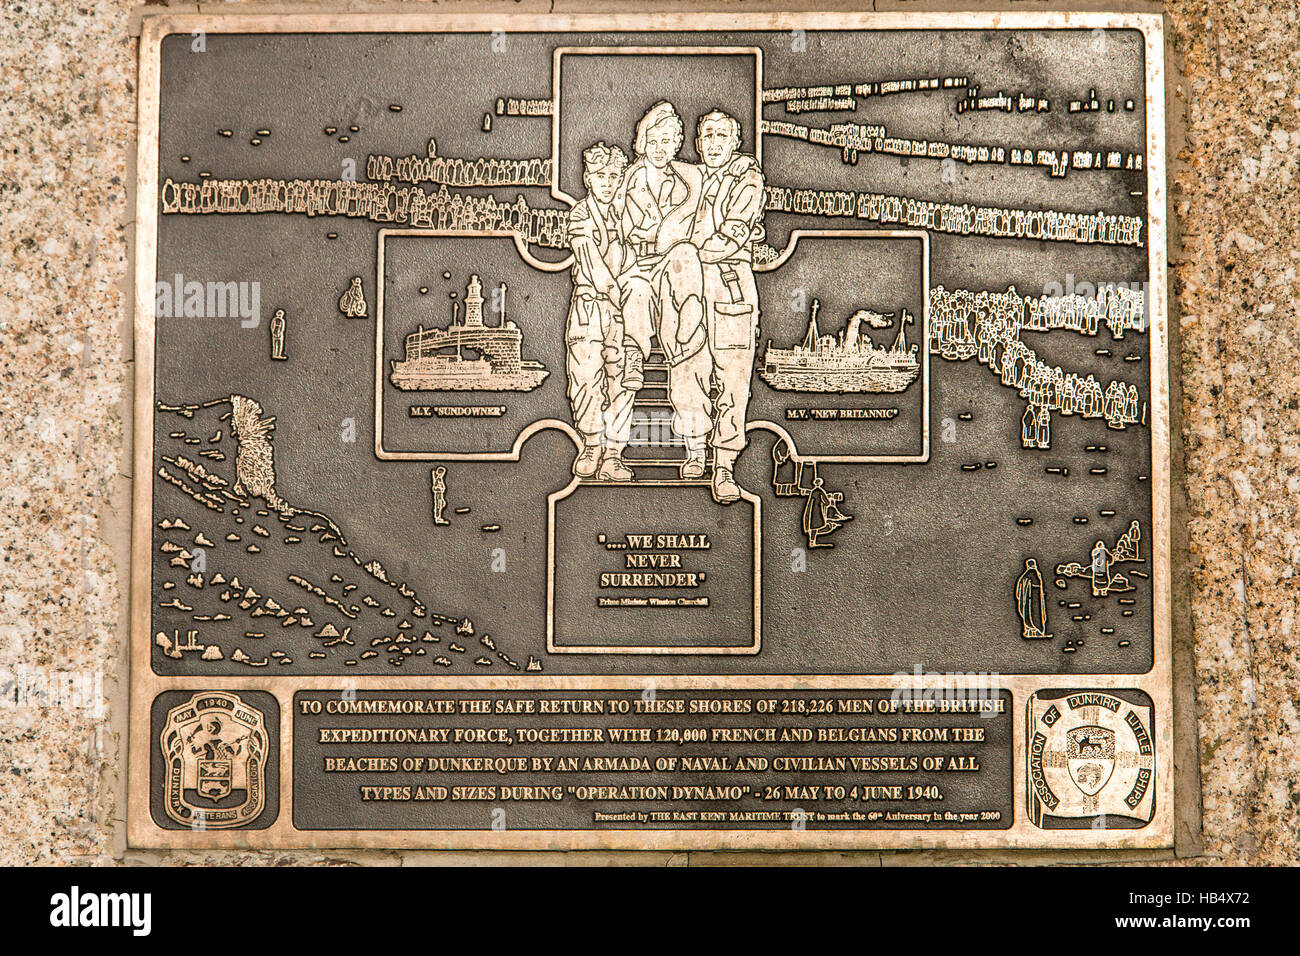 England, Ramsgate. Operation Dynamo memorial, commemorating the Dunkerque evacuation. - Stock Image